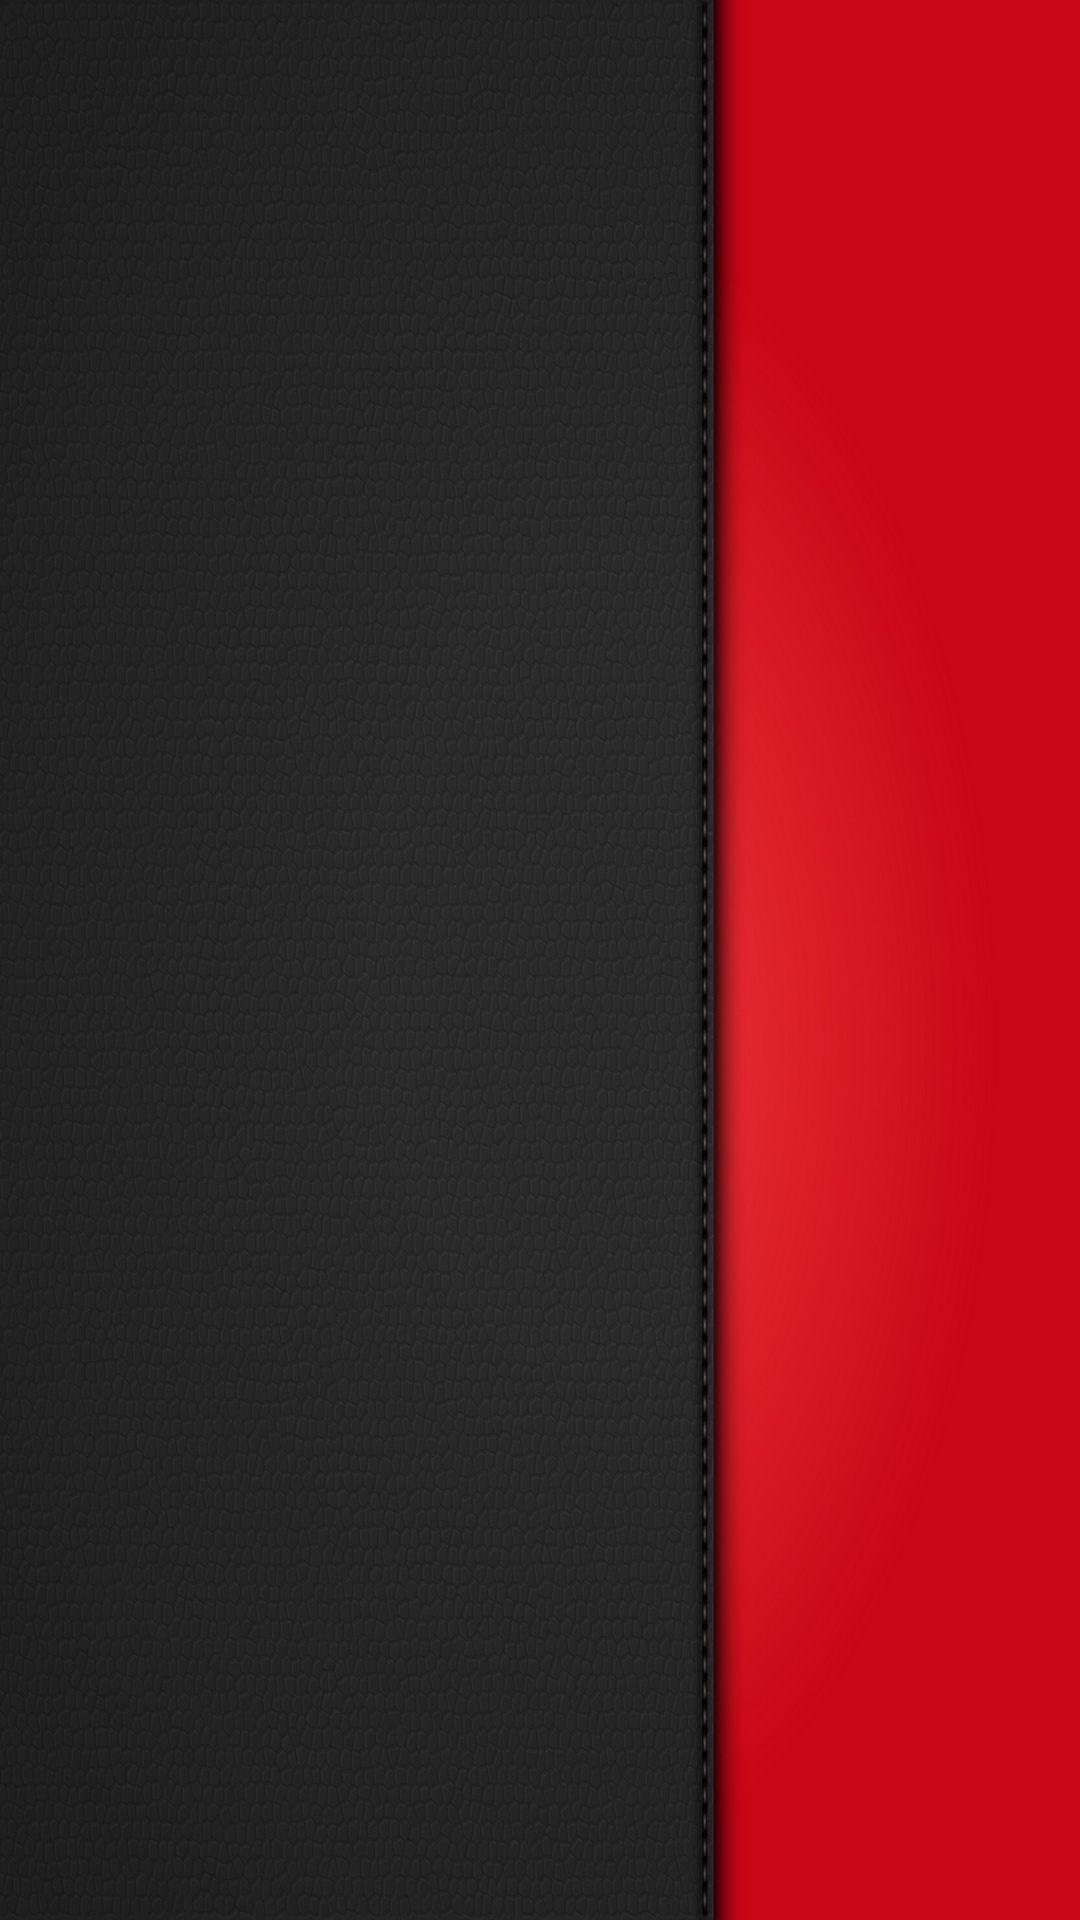 0 Orange Black Wallpaper Group Red iPhone 6 Plus Wallpaper